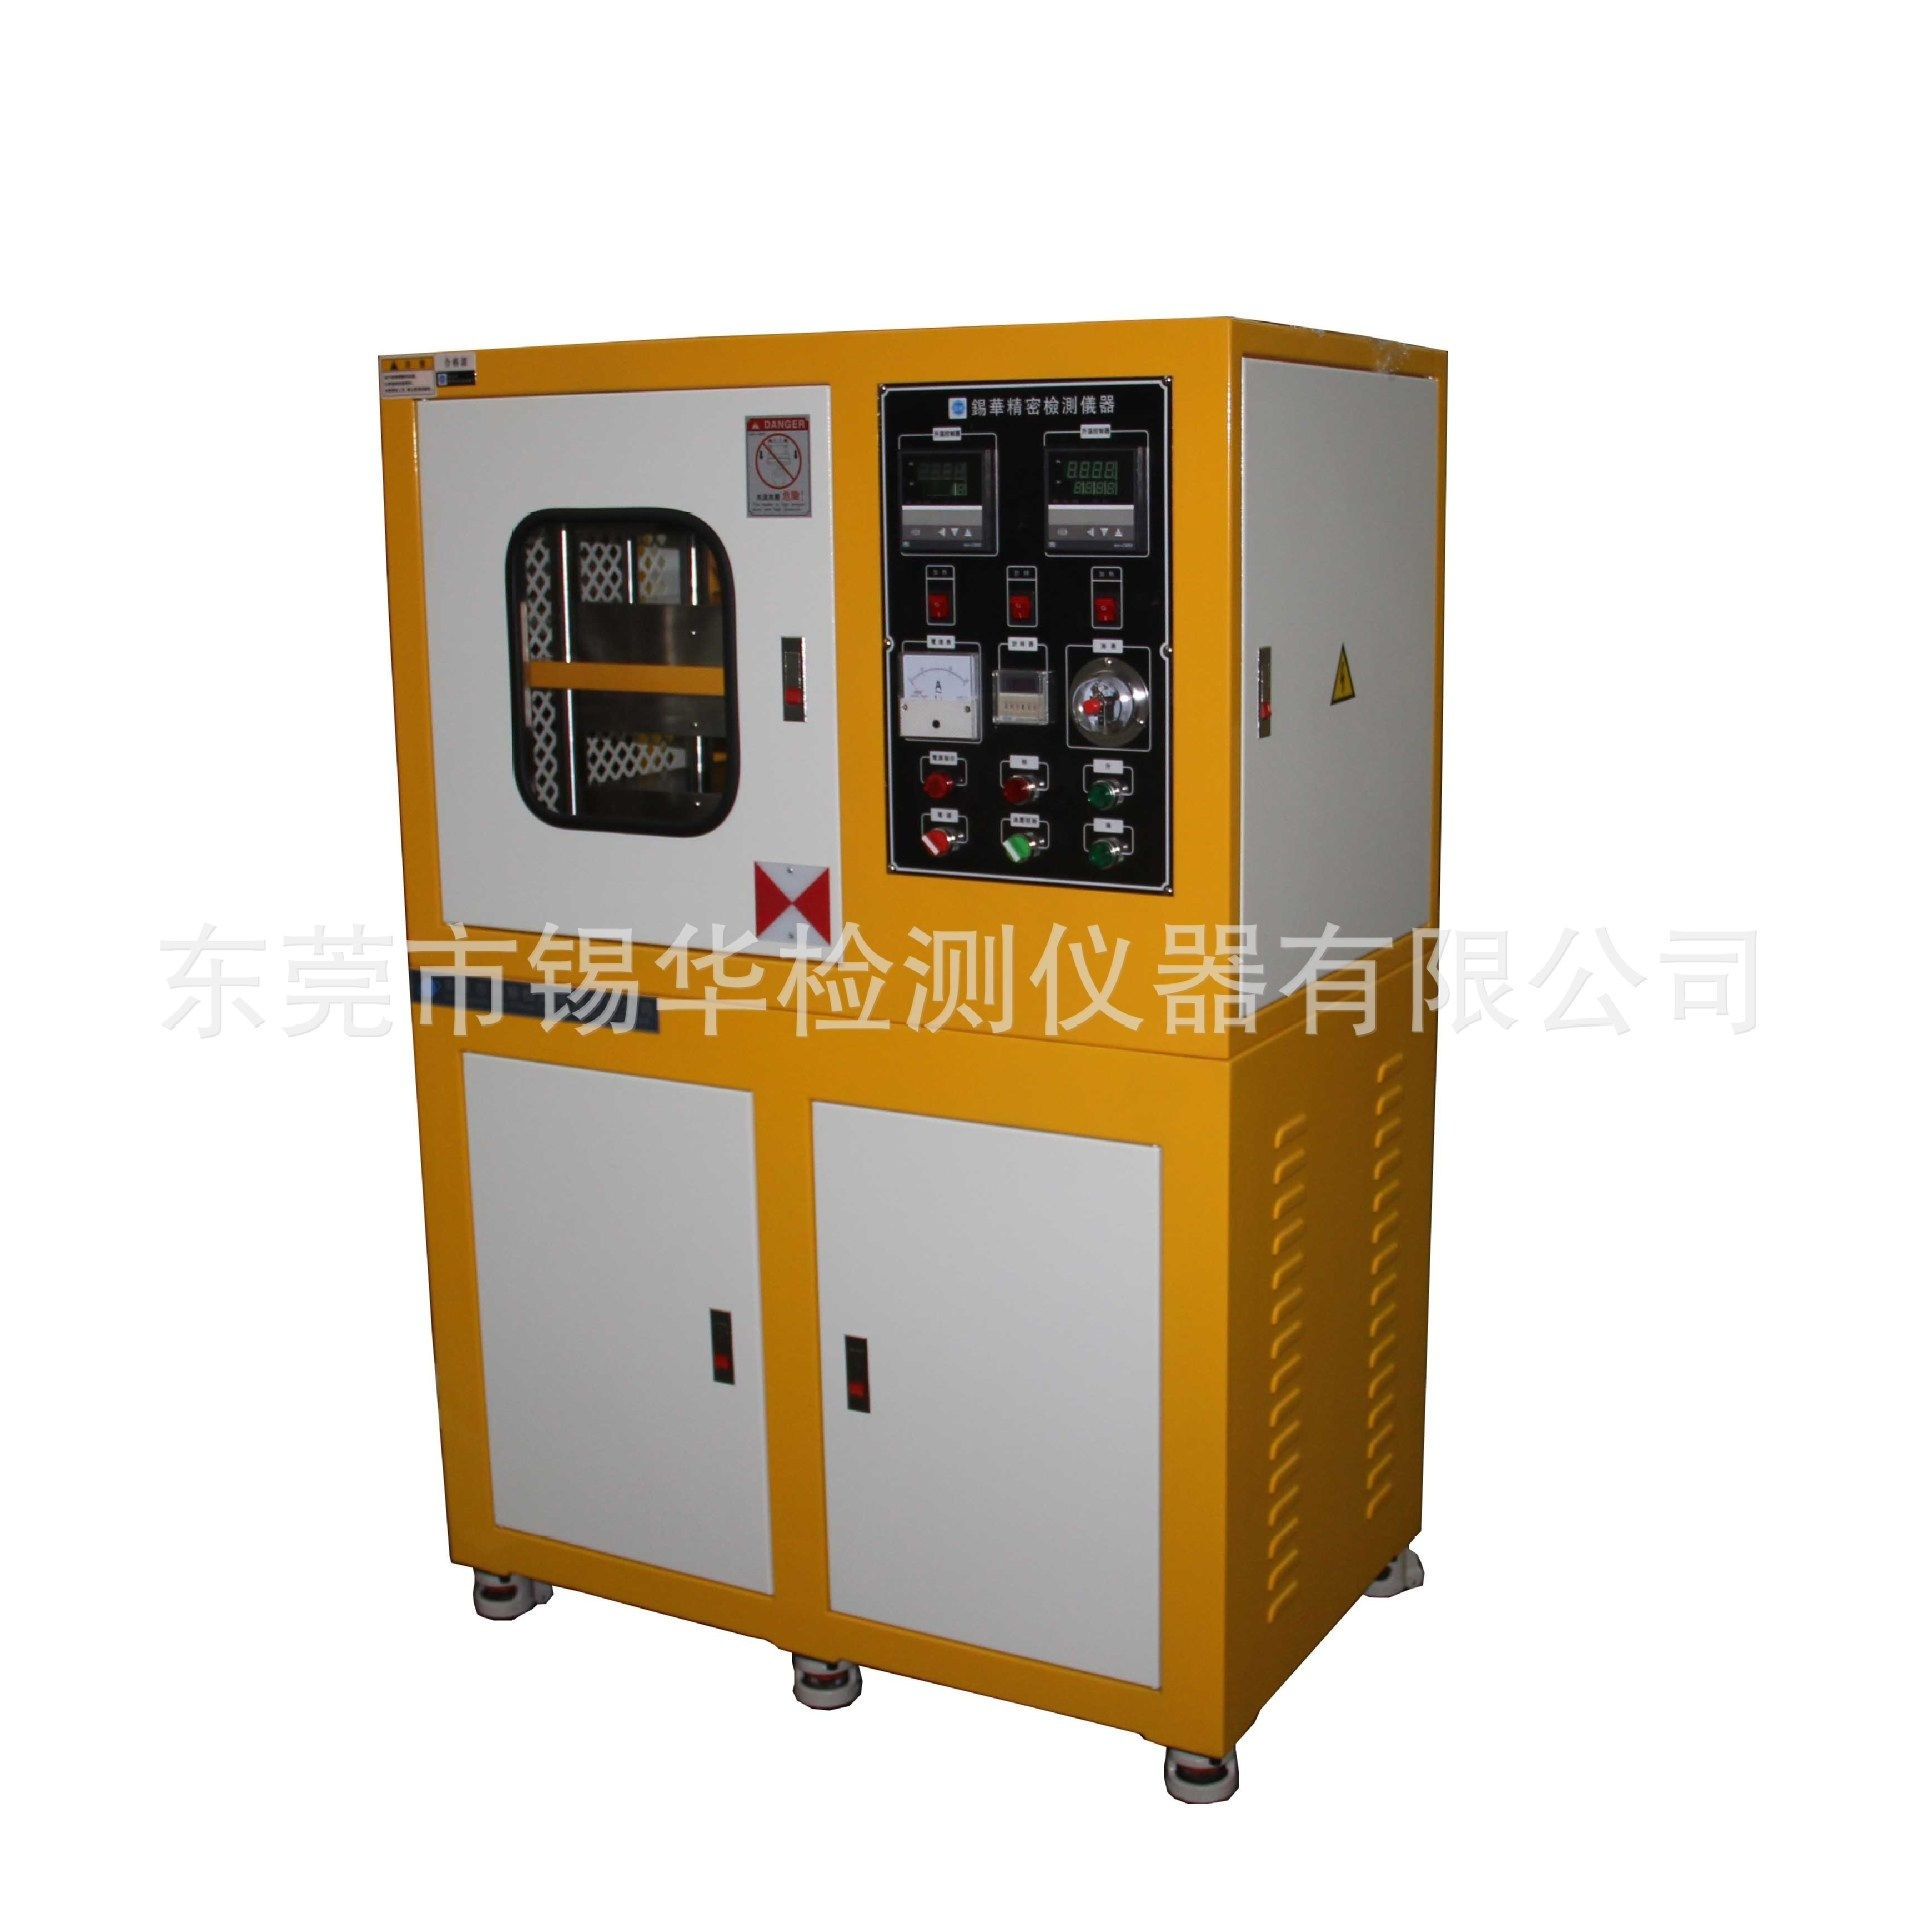 XH-406B-30-300電動加硫成型機(壓片機).jpg